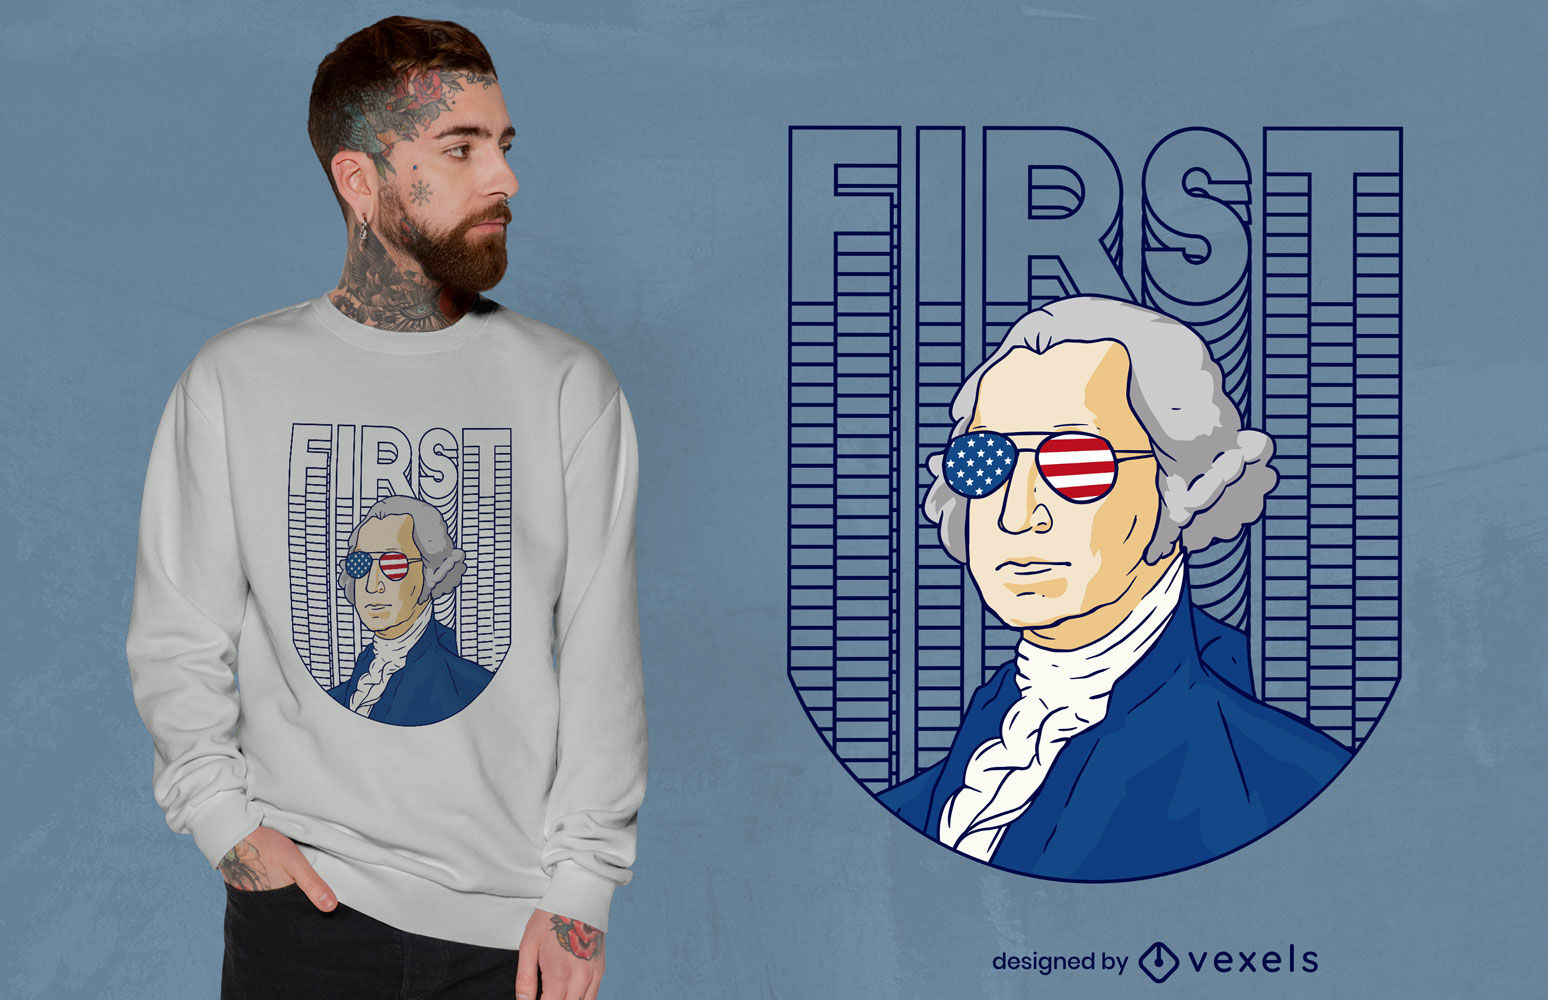 Cool Washington t-shirt design